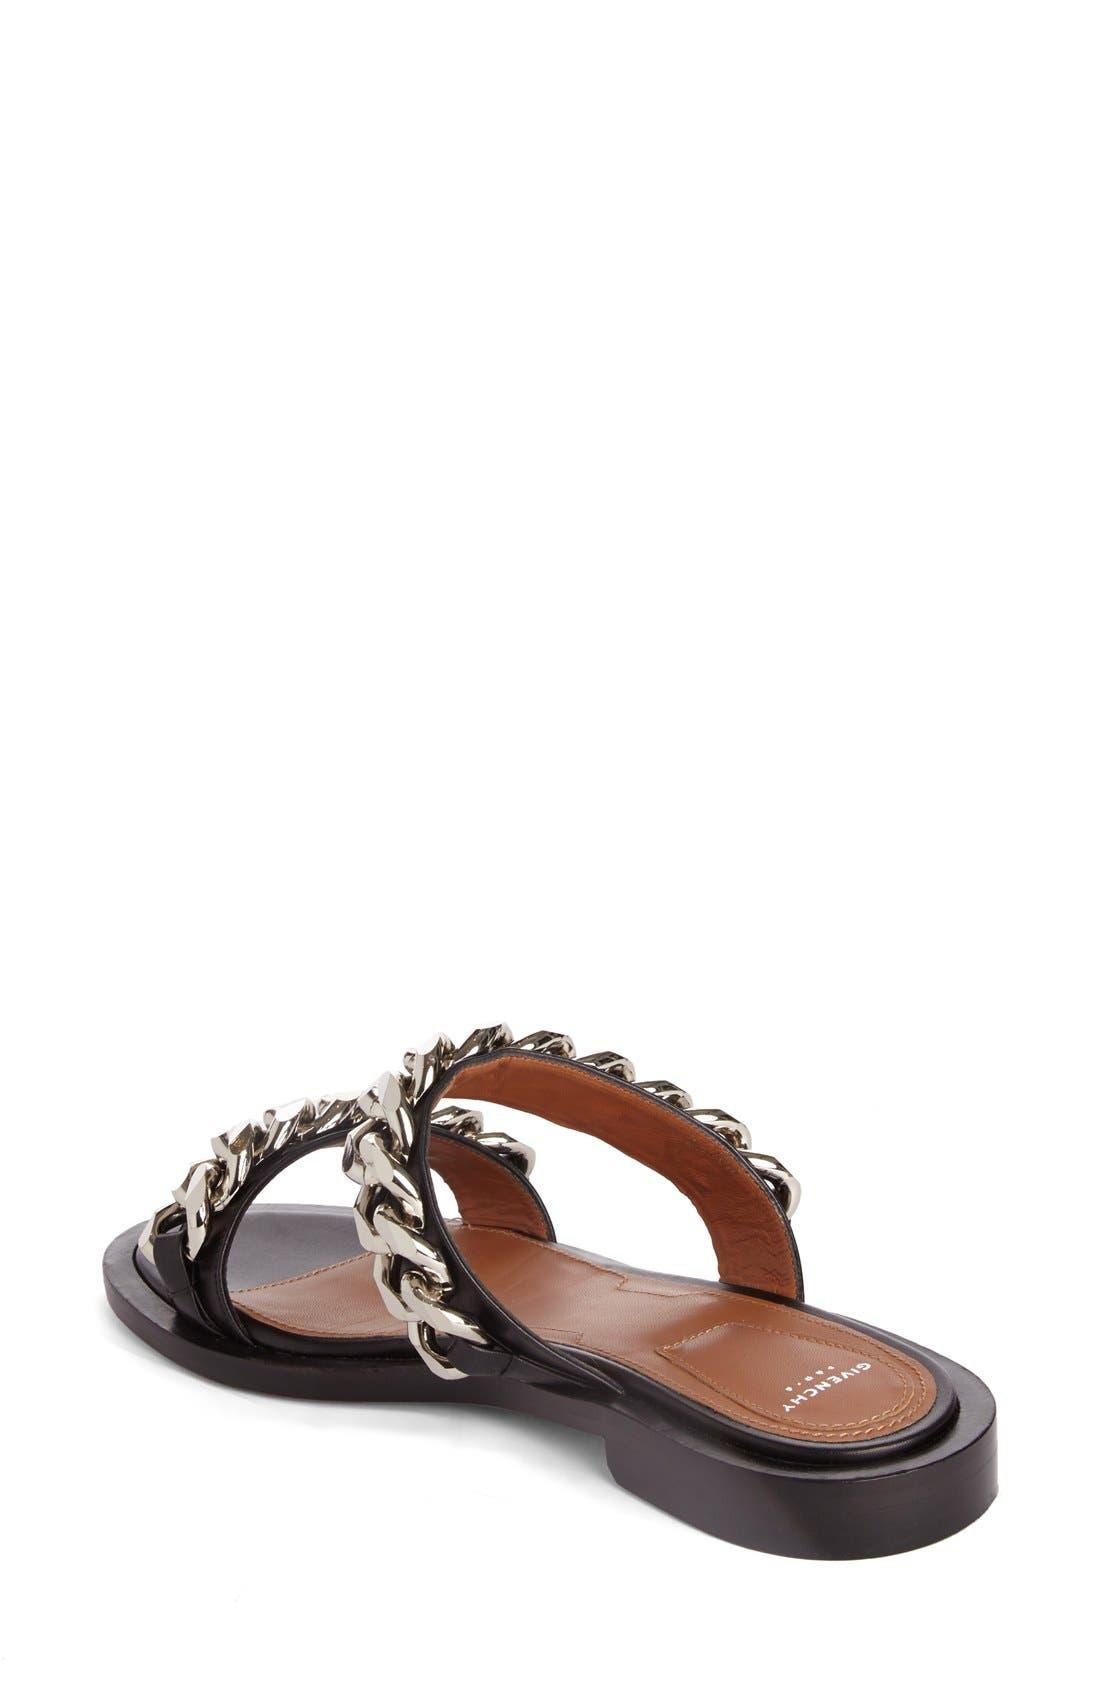 Alternate Image 2  - Givenchy Double Chain Slide Sandal (Women)